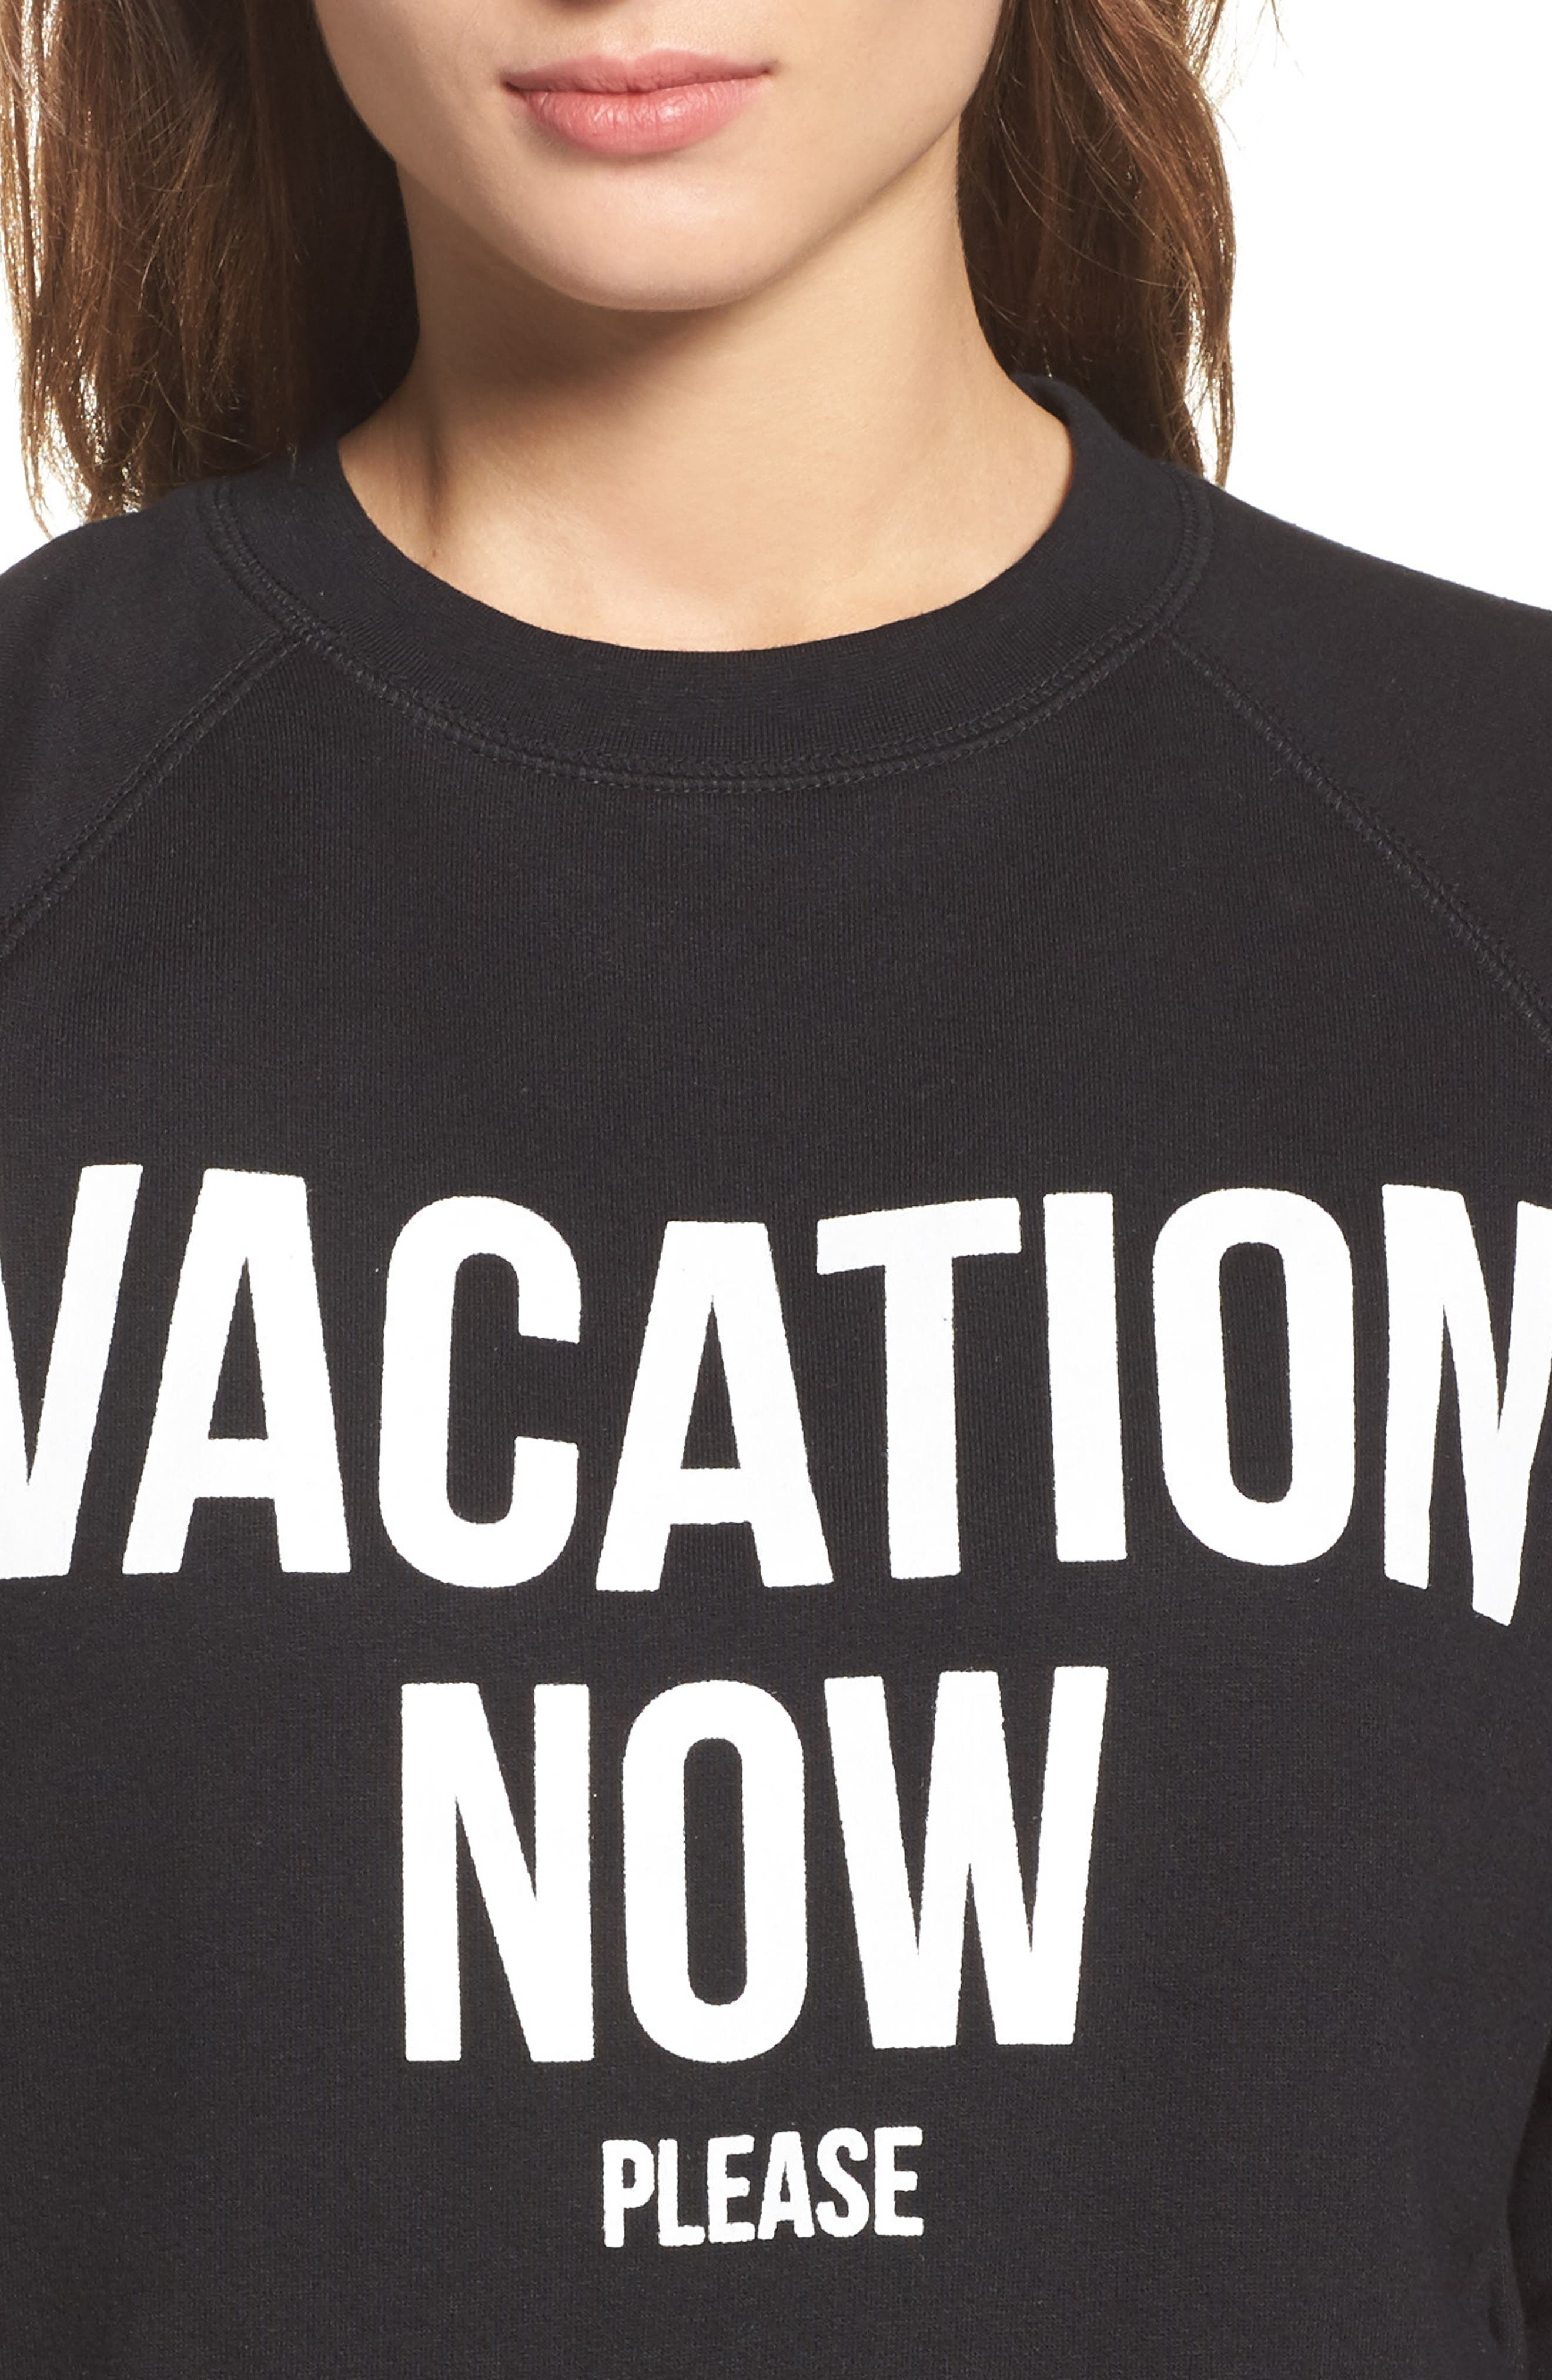 Vacation Now Sweatshirt,                             Alternate thumbnail 4, color,                             001